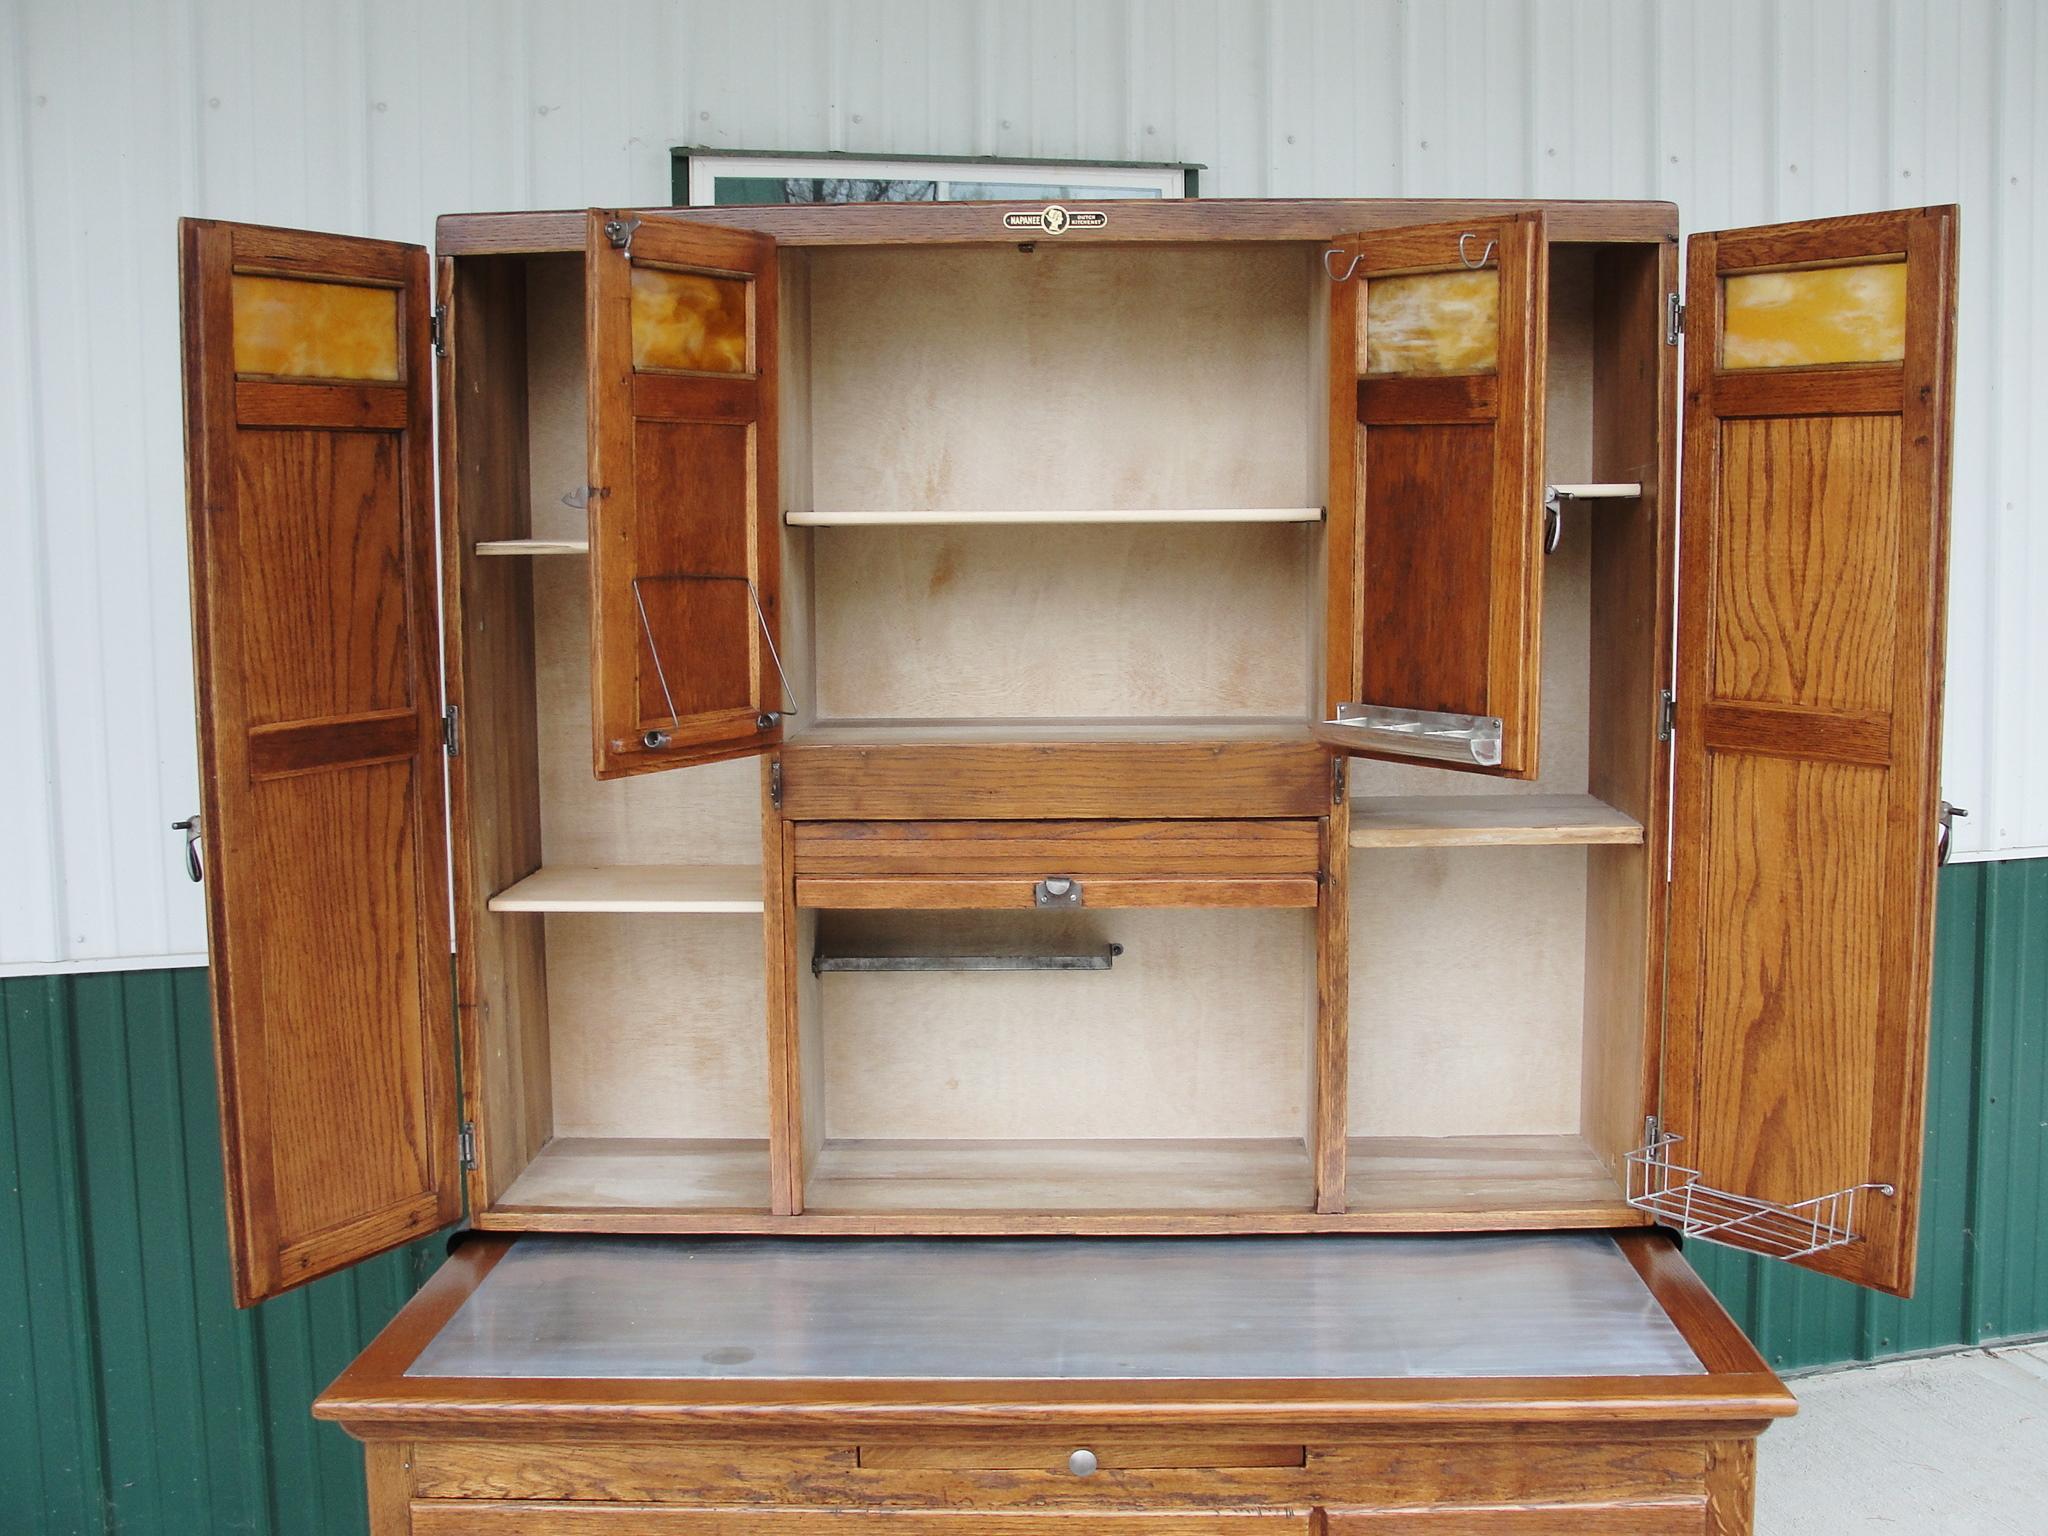 vintage napanee oak kitchen cabinet from breadandbutter on ruby lane